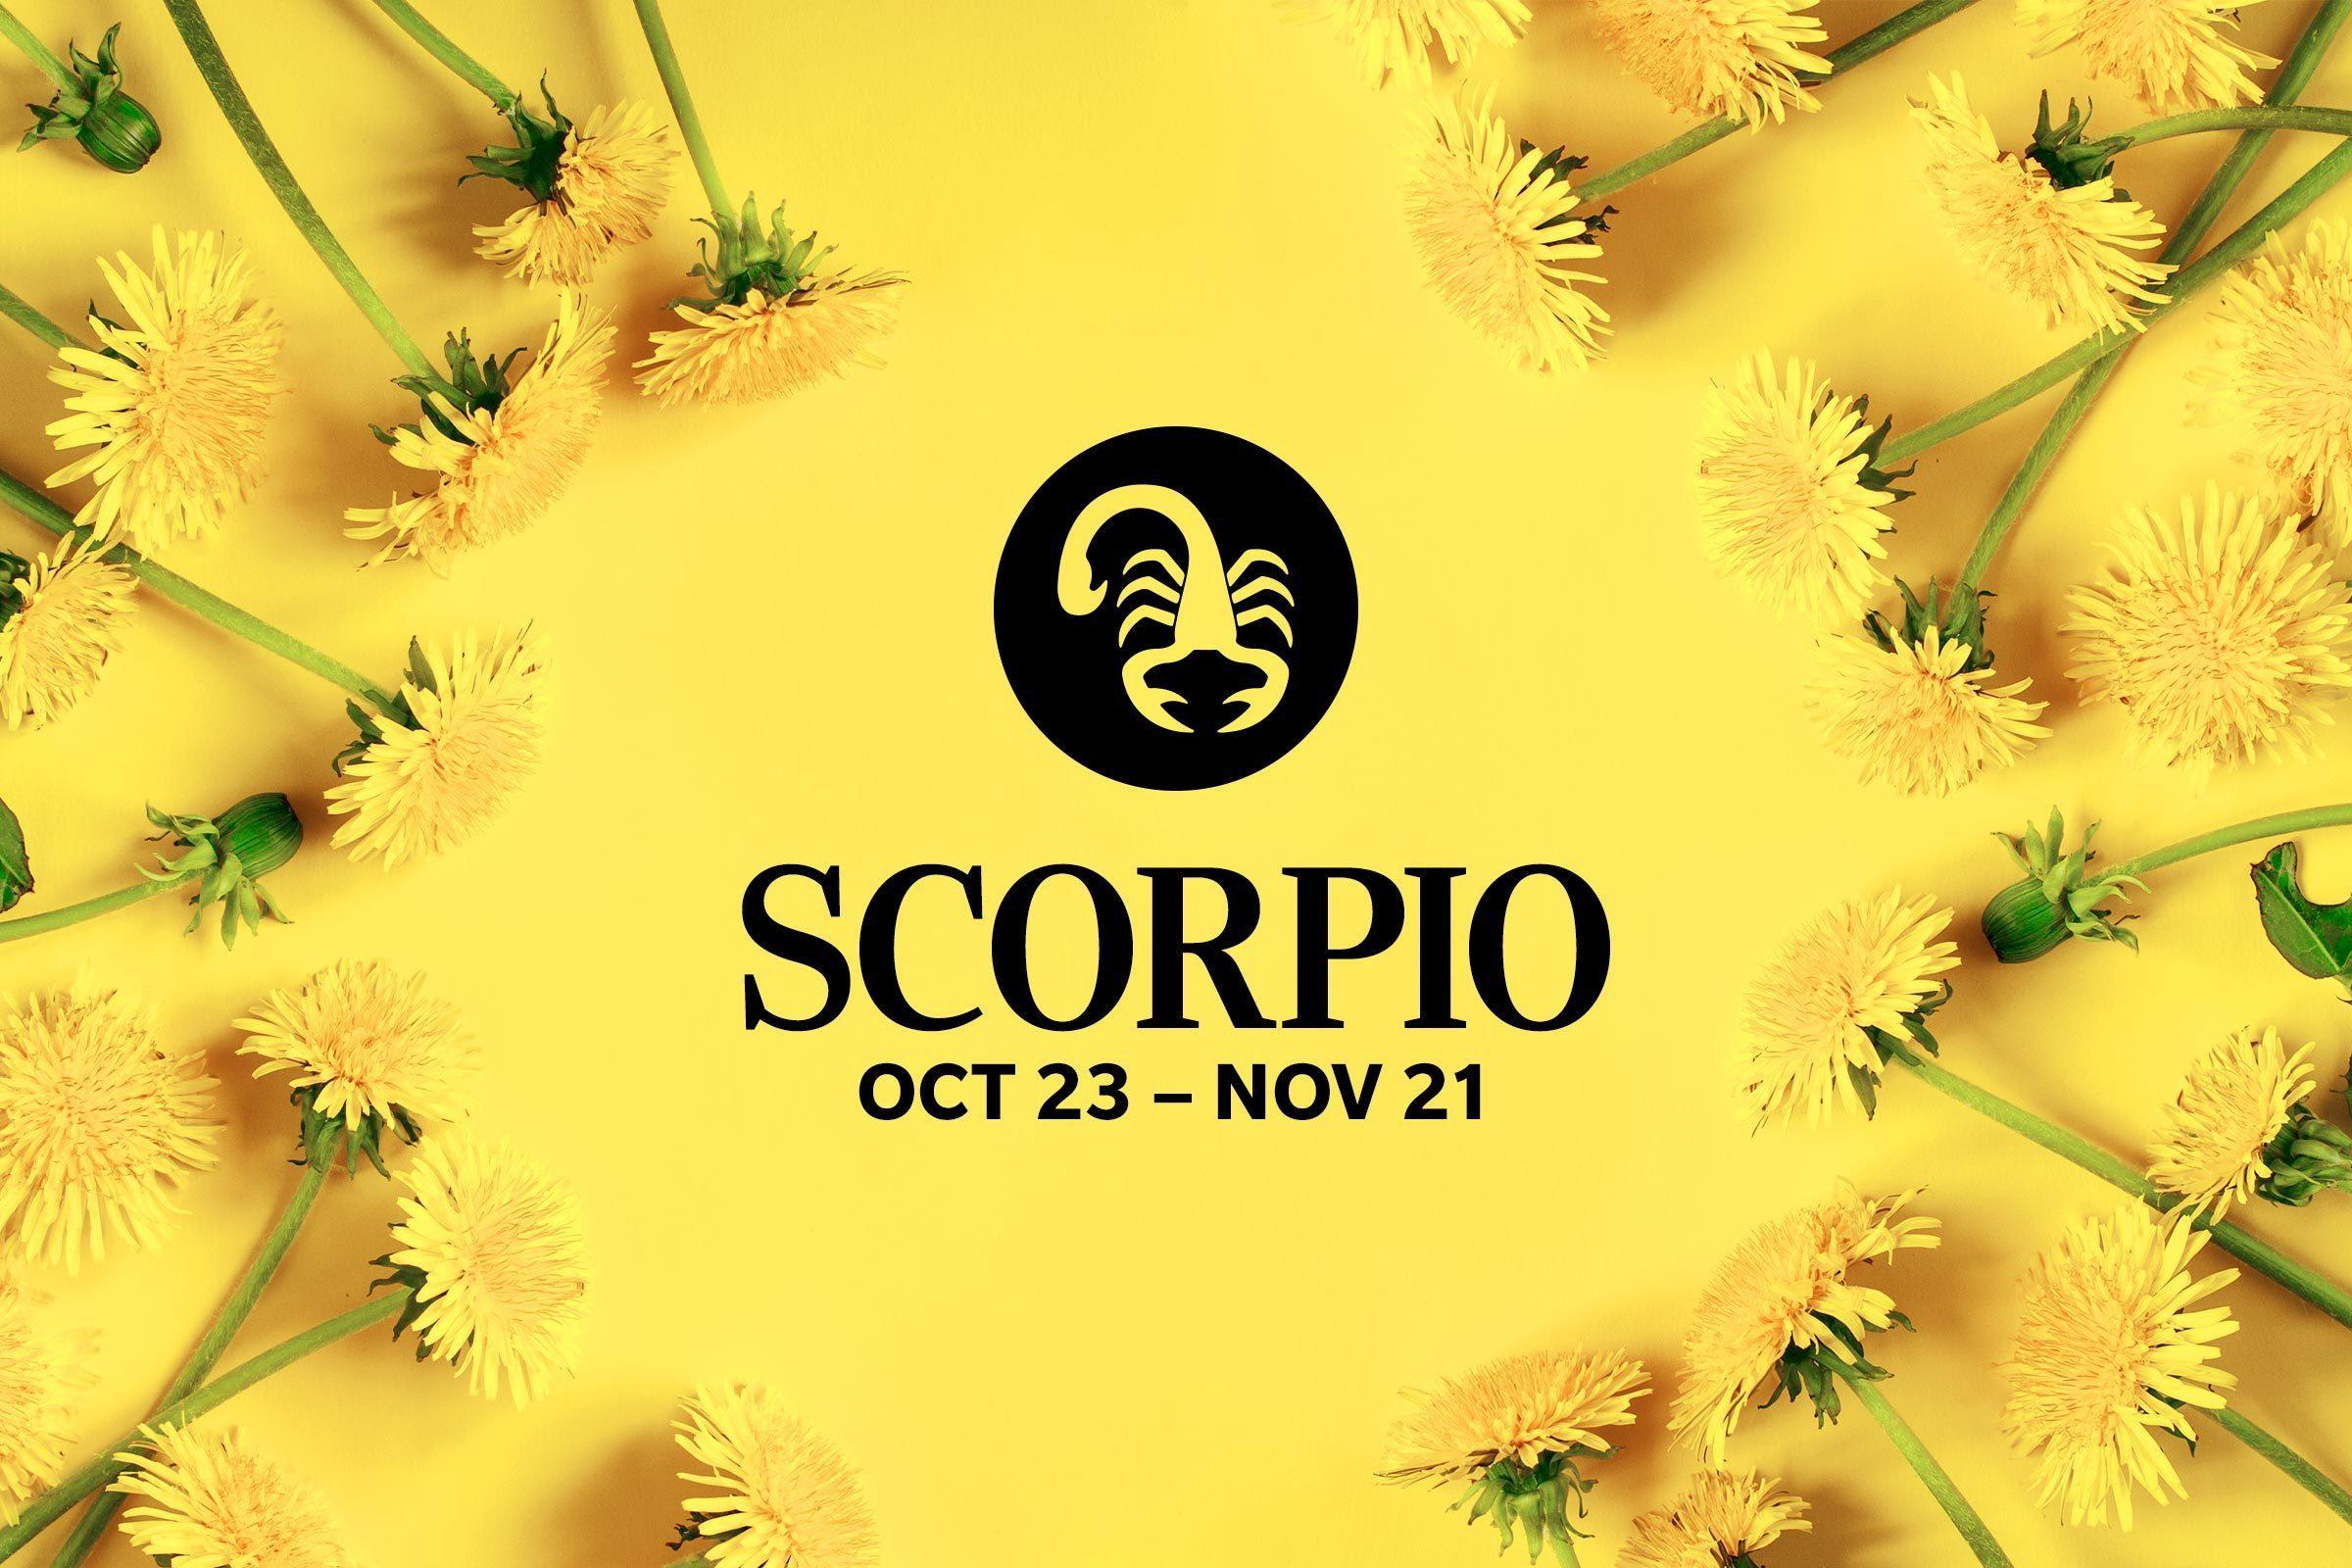 Scorpio (October 23-November 21)